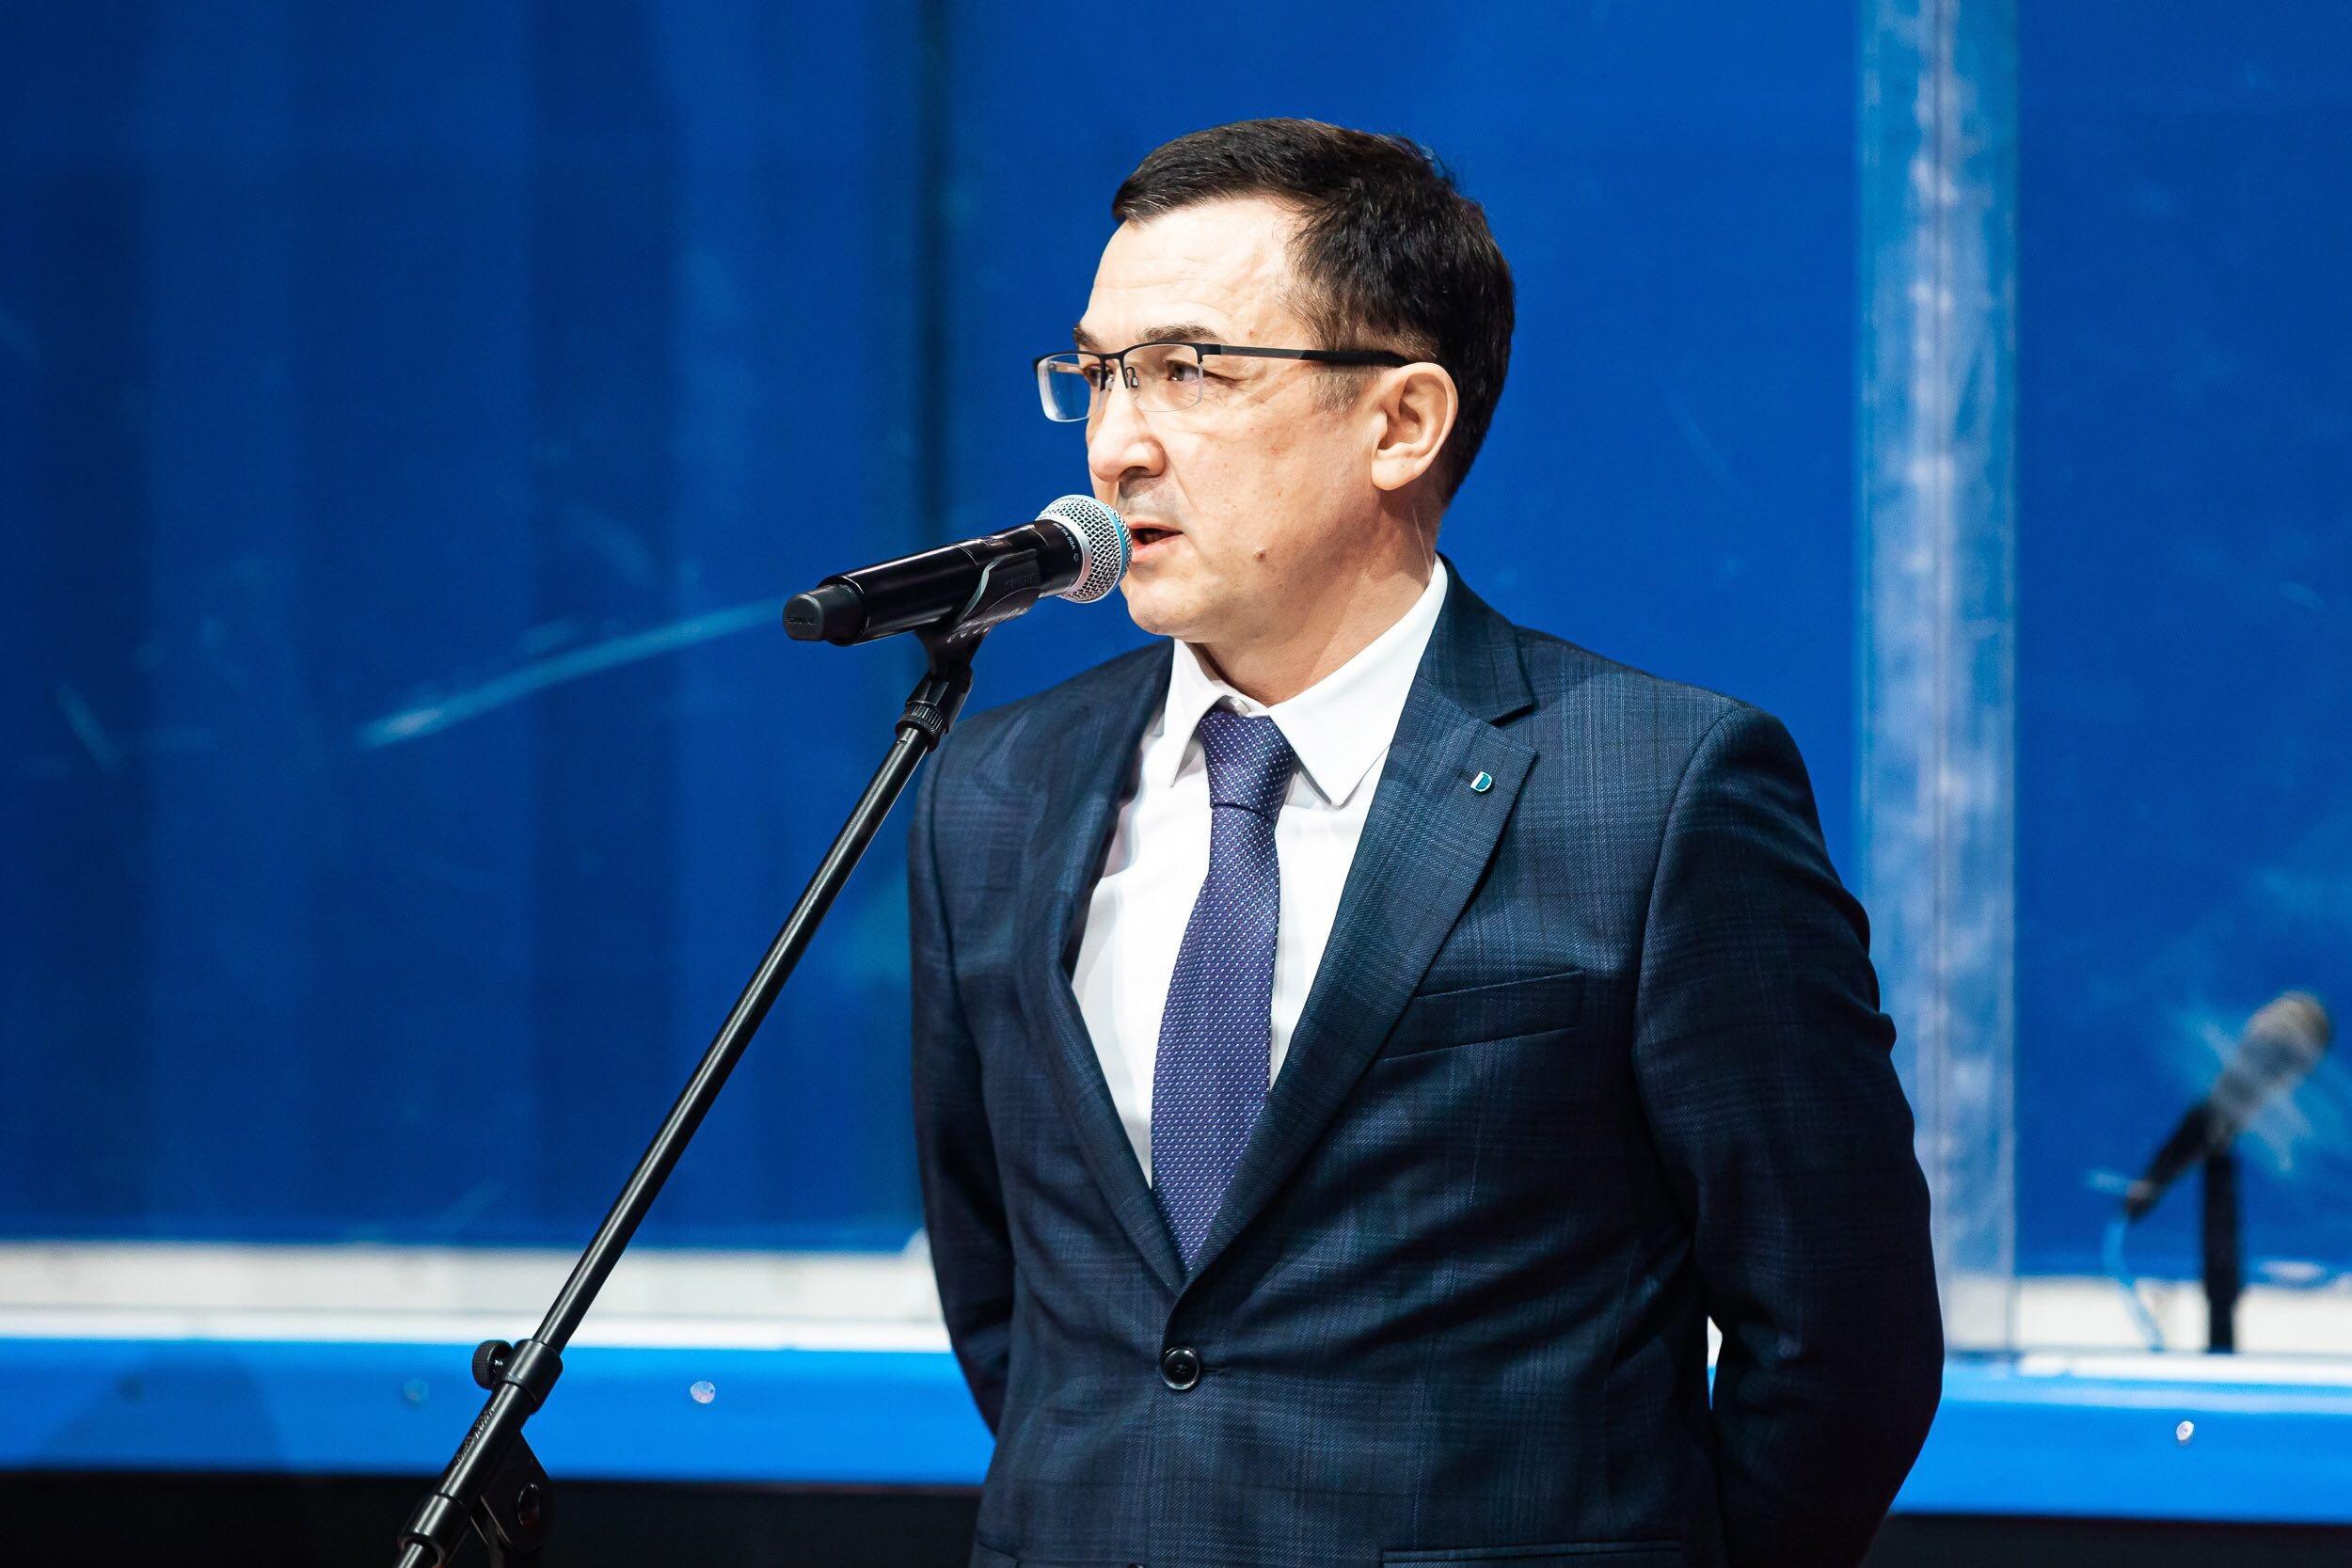 https://img-sport.business-gazeta.ru/images/cb/7bcc-724877f7b7ceaec4a4b8f44468cbf9c6.jpg